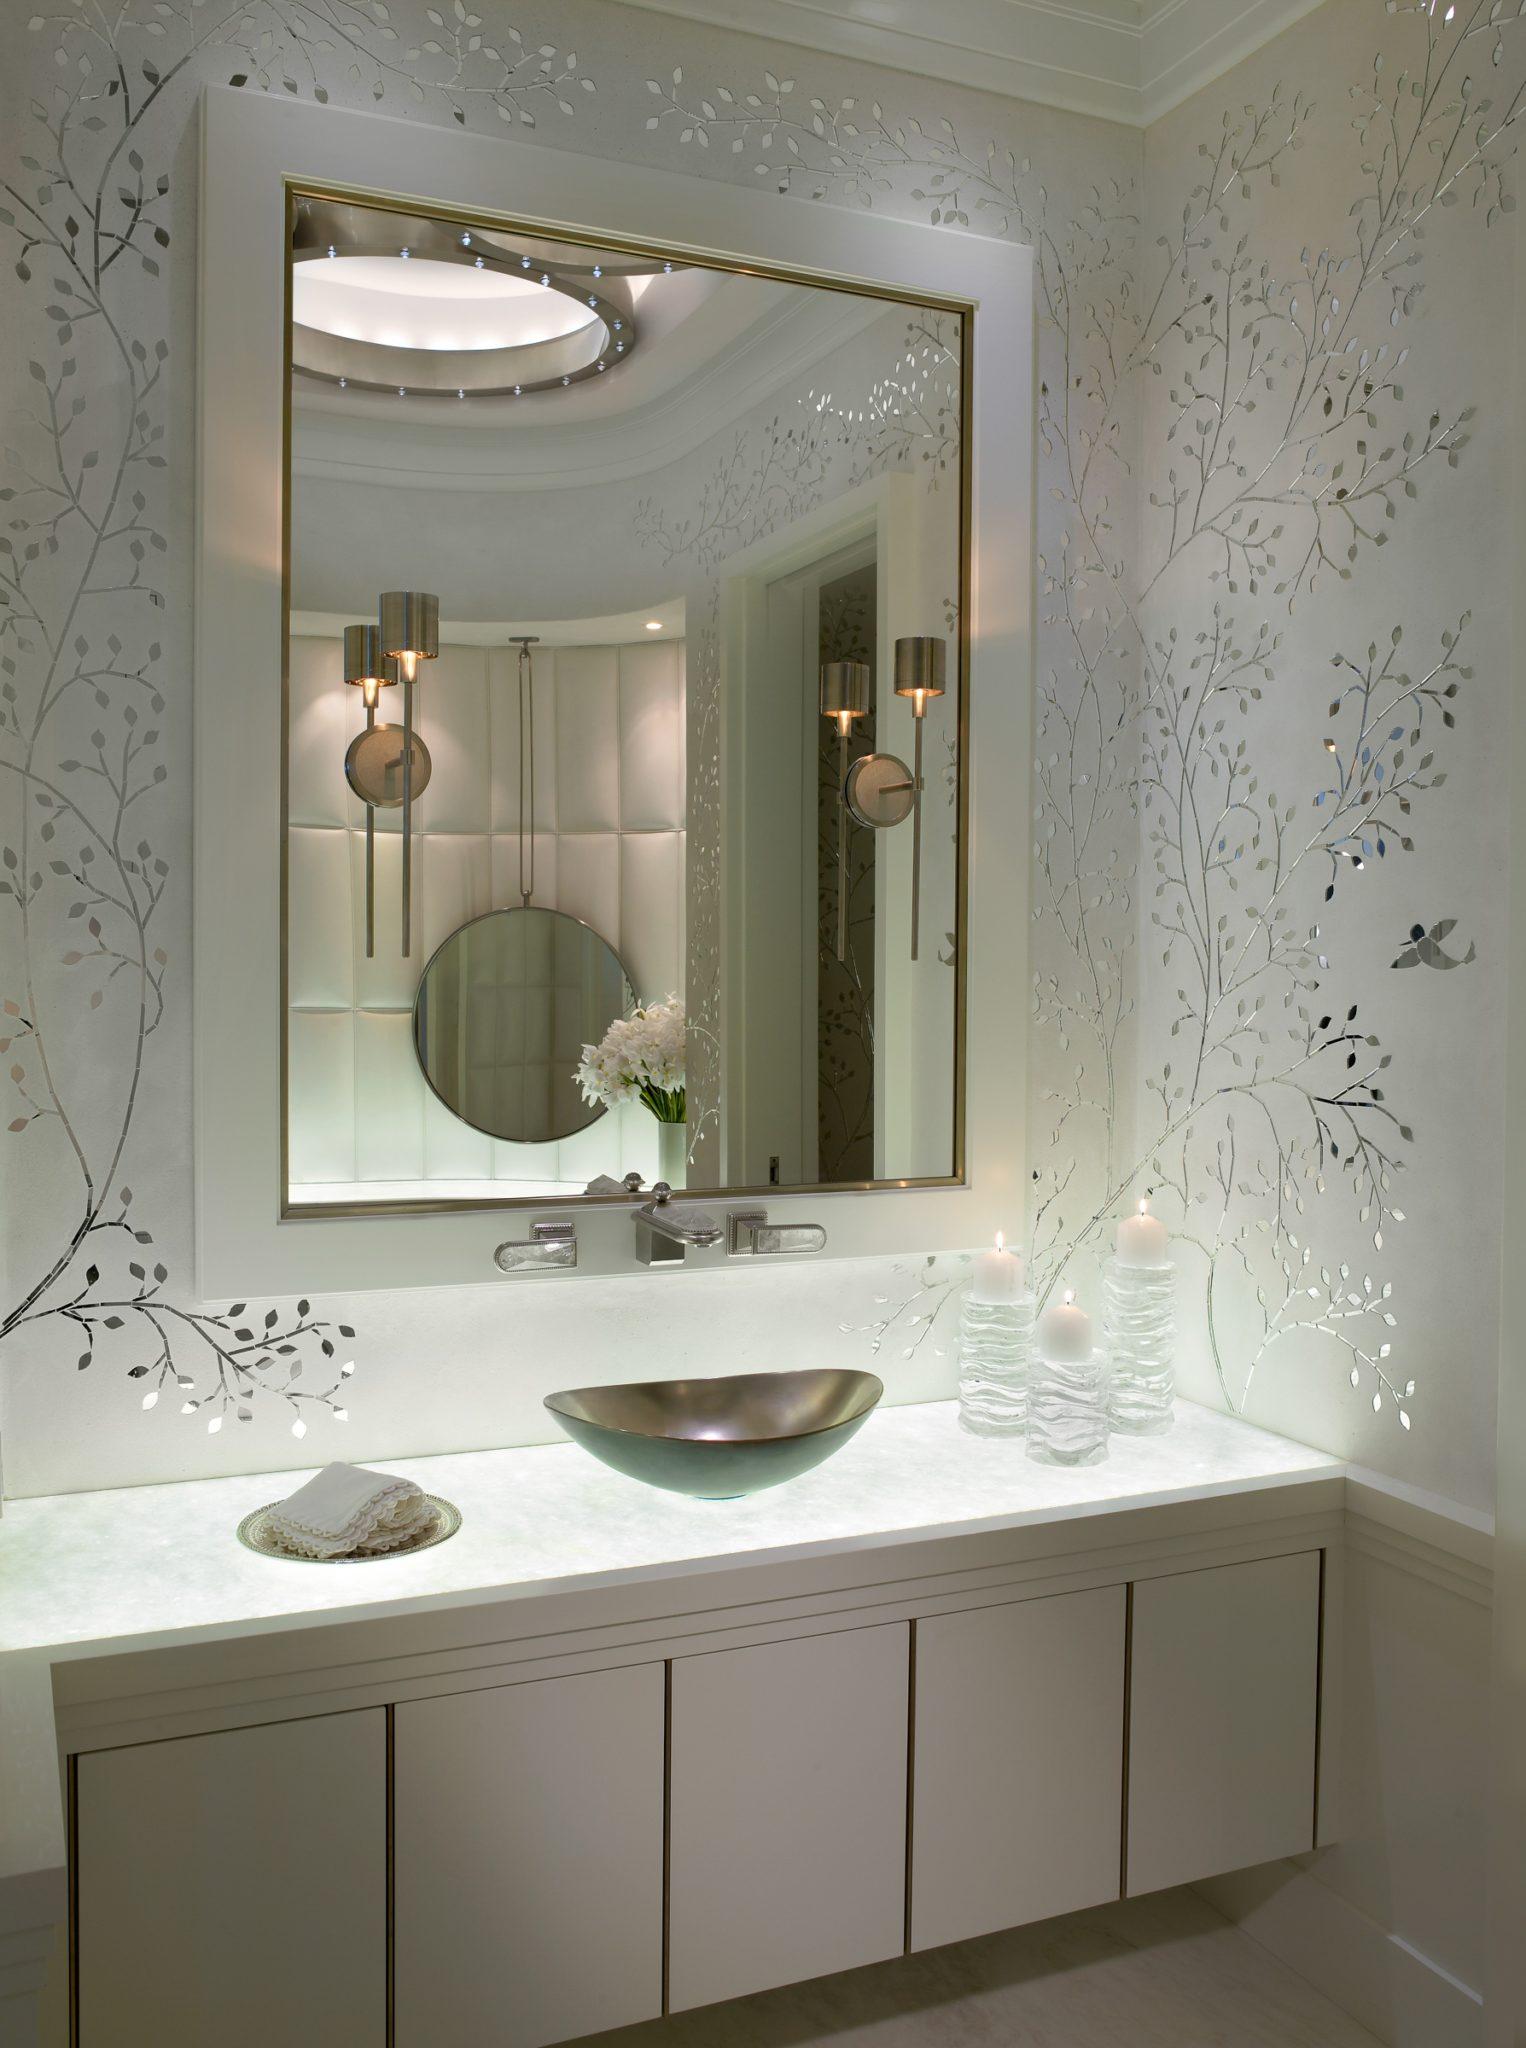 Delicately branching metallic wallpaper adds shine to this modern powder room. by Alene Workman Interior Design